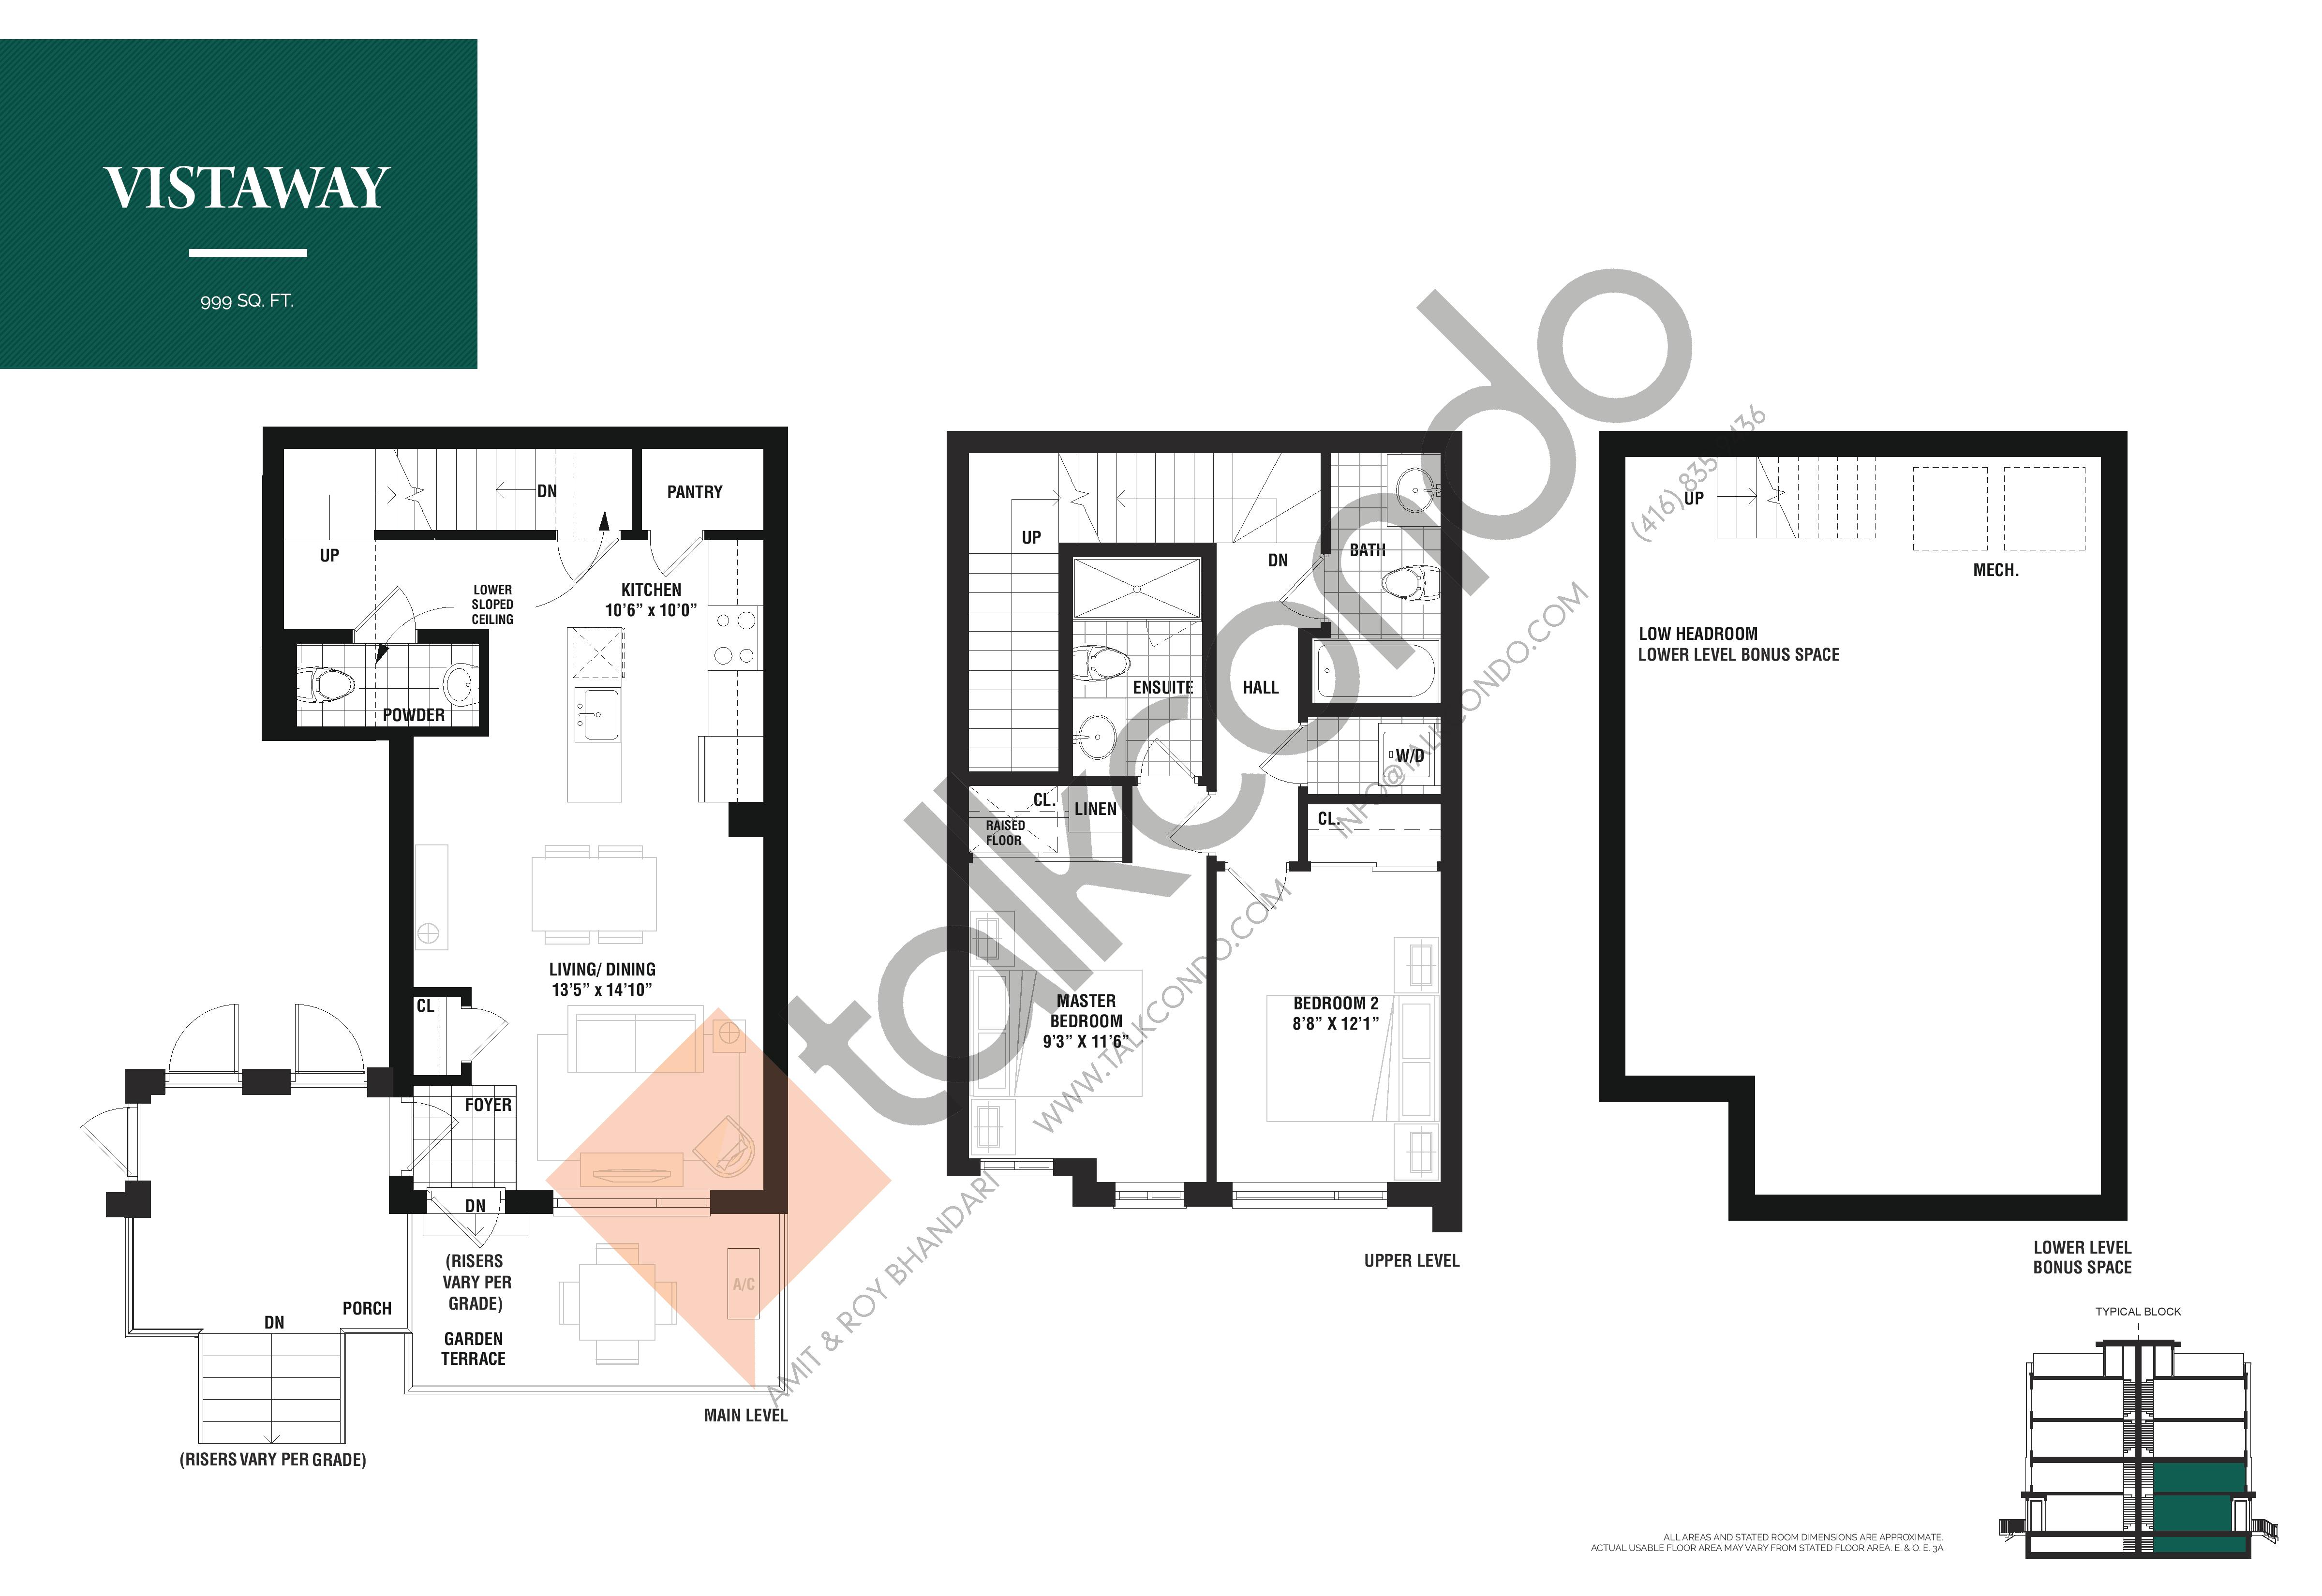 Vistaway Floor Plan at The Way Urban Towns - 999 sq.ft